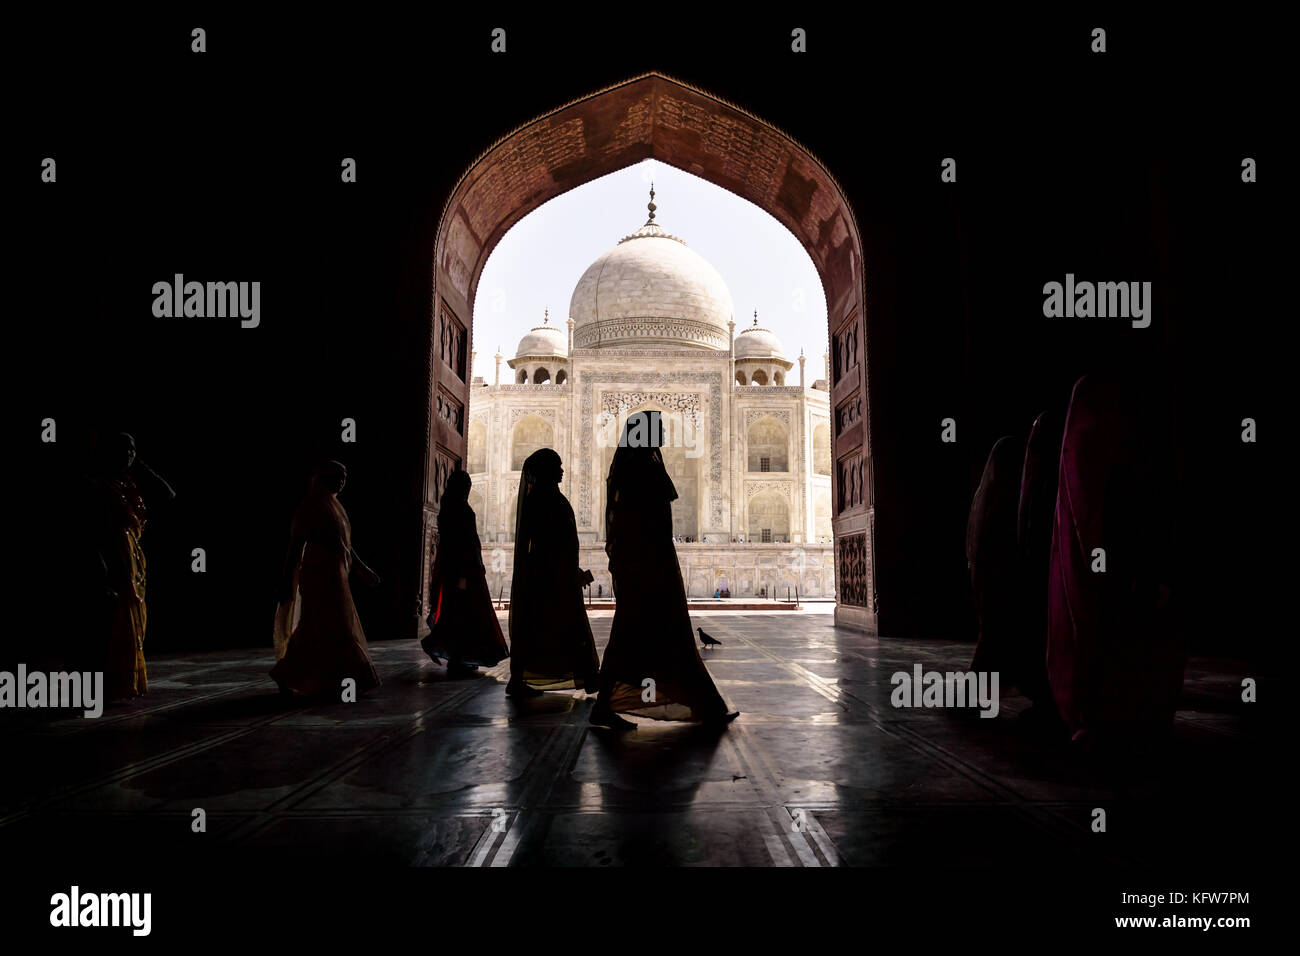 Argra, Taj Mahal, Indien - 3. März 2012: Frauen in traditionellen Saris, Arch im Taj Mahal in Agra, Uttar Pradesh, Stockbild